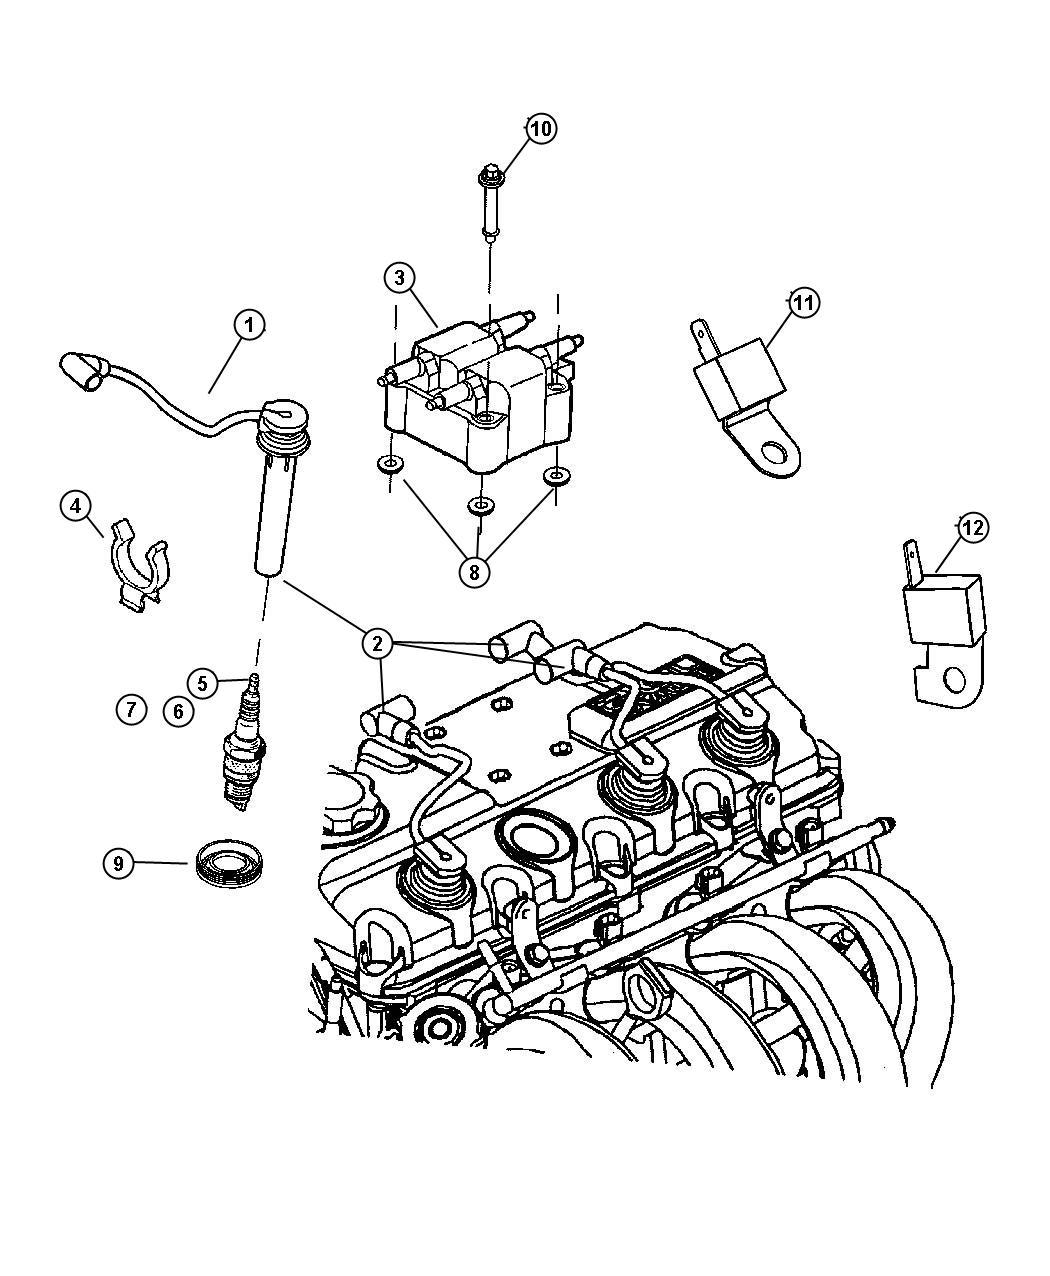 2011 Dodge NITRO Spark plug. Re16mc. Optional. Plugs